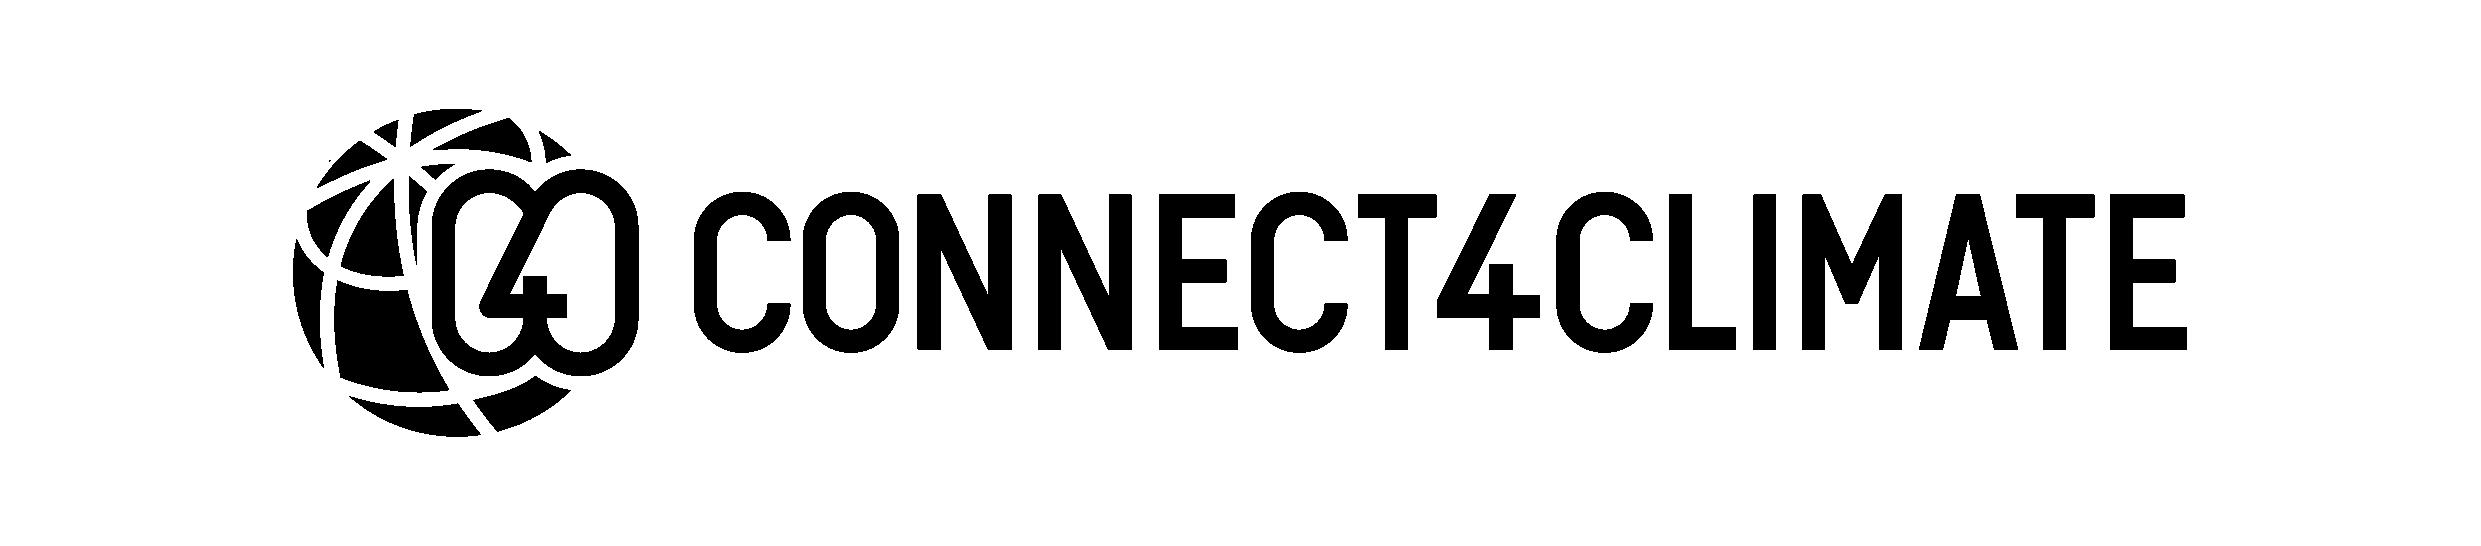 Connect4Climate Logo: Black Version